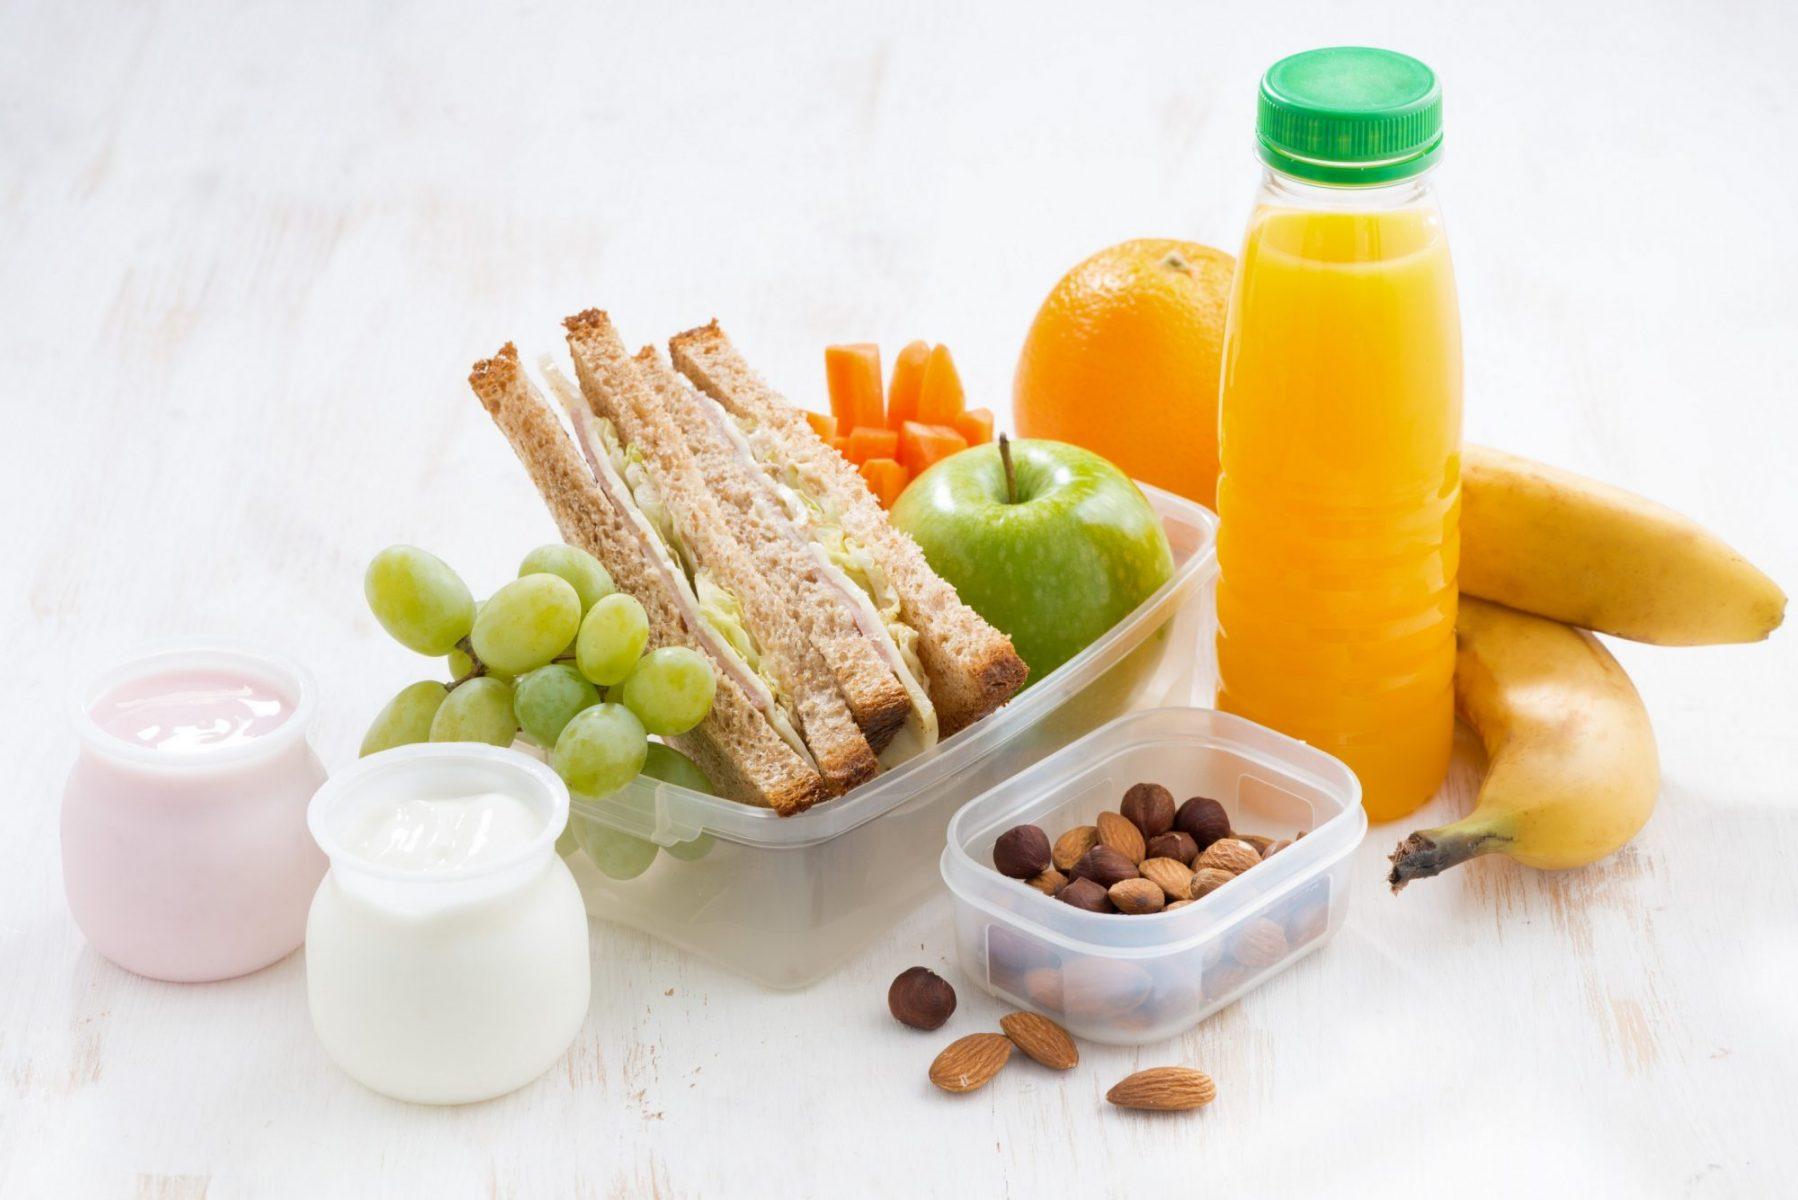 Lincoln Employee Benefit | Micro-Market Service | Snacks | Break Rooms